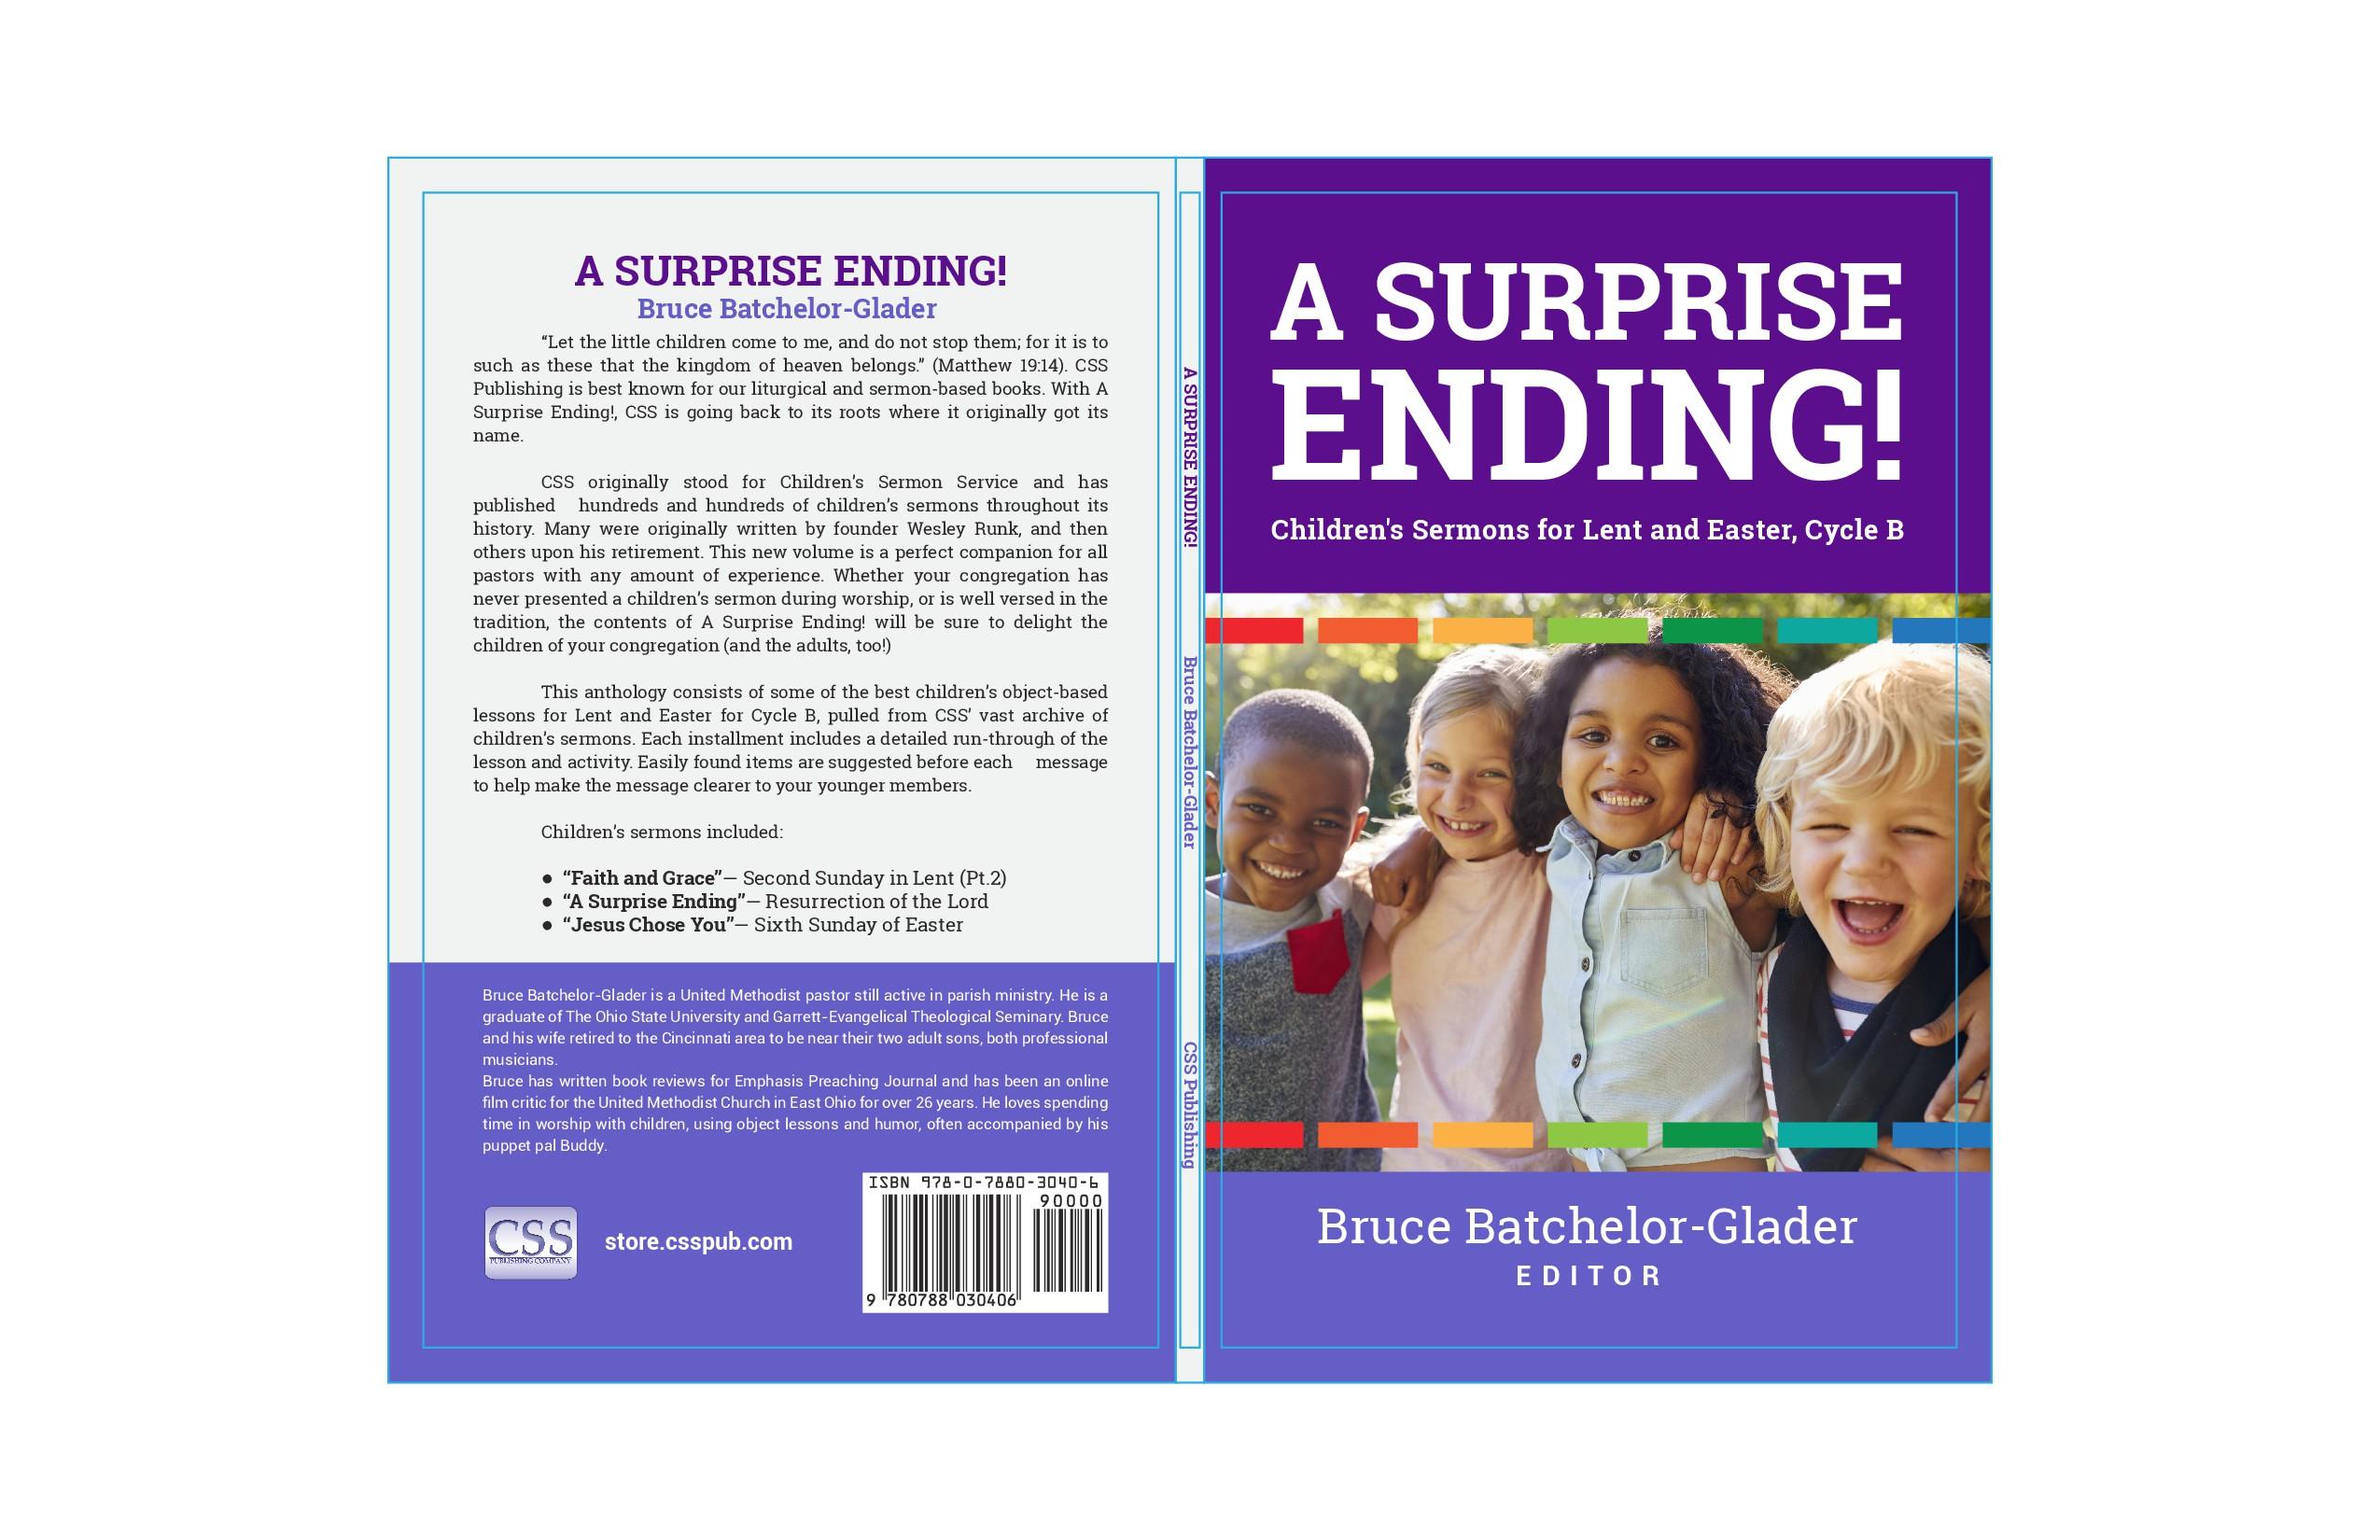 Book Cover Design Needed for Children's Sermon's Book - A Surprise Ending!